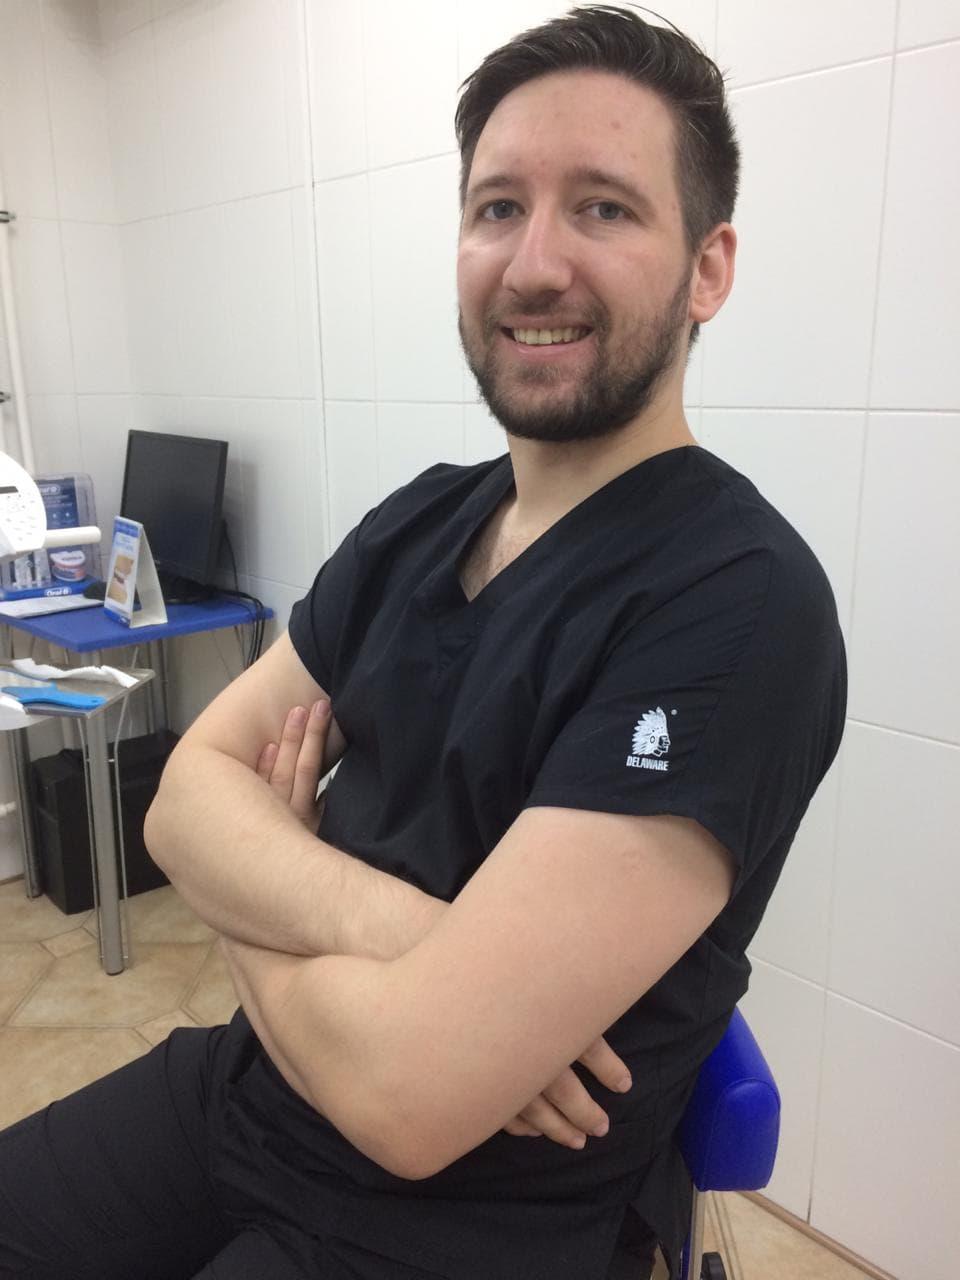 Врач-стоматолог, терапевт-хирург Галлямов Рамис Равильевич